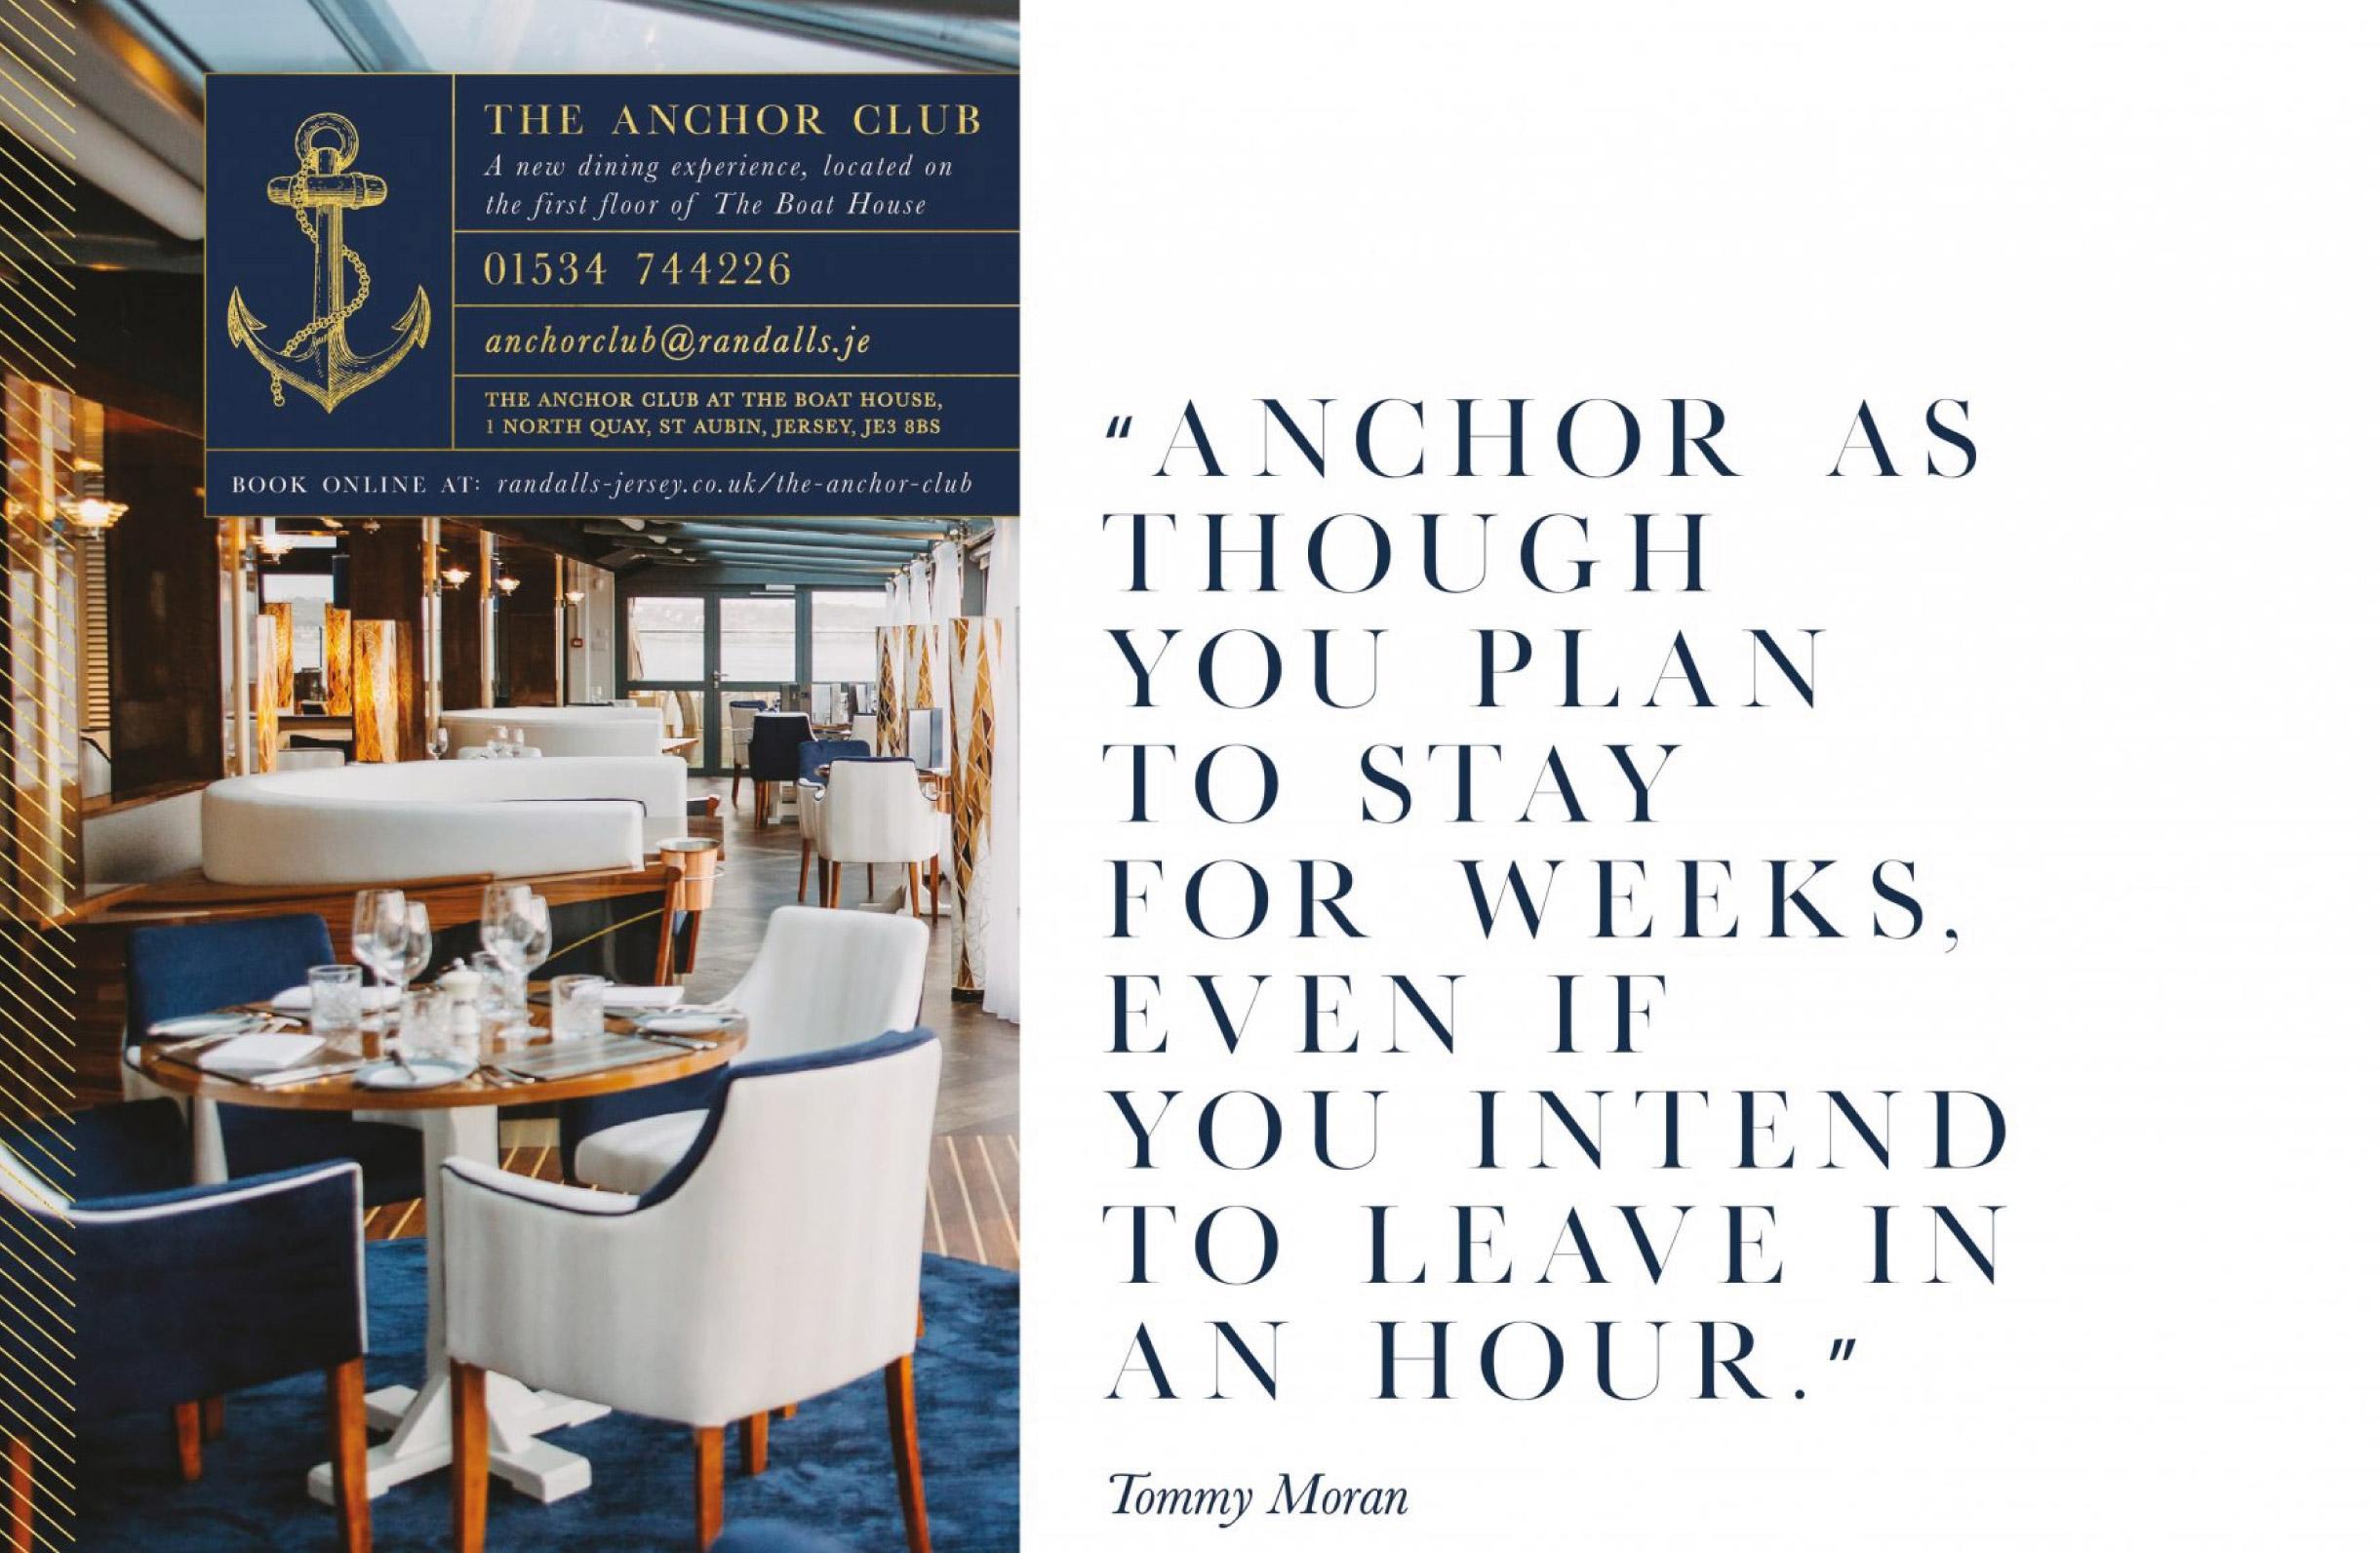 Quints Design co - The Anchor Club - Advert Design